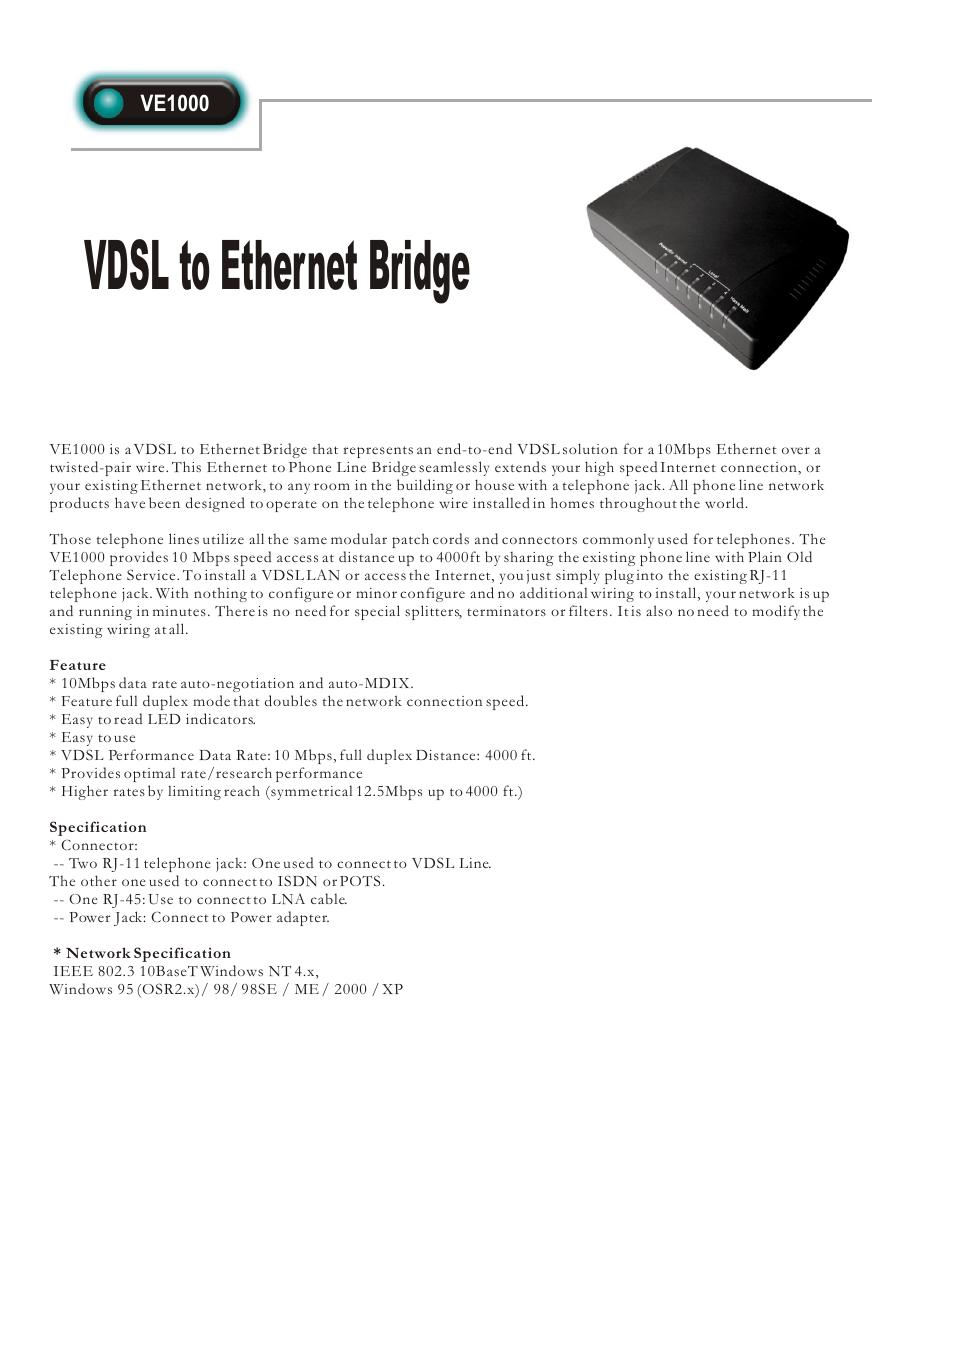 Abocom Vdsl To Ethernet Bridge Ve1000 User Manual 1 Page Using House Wiring For